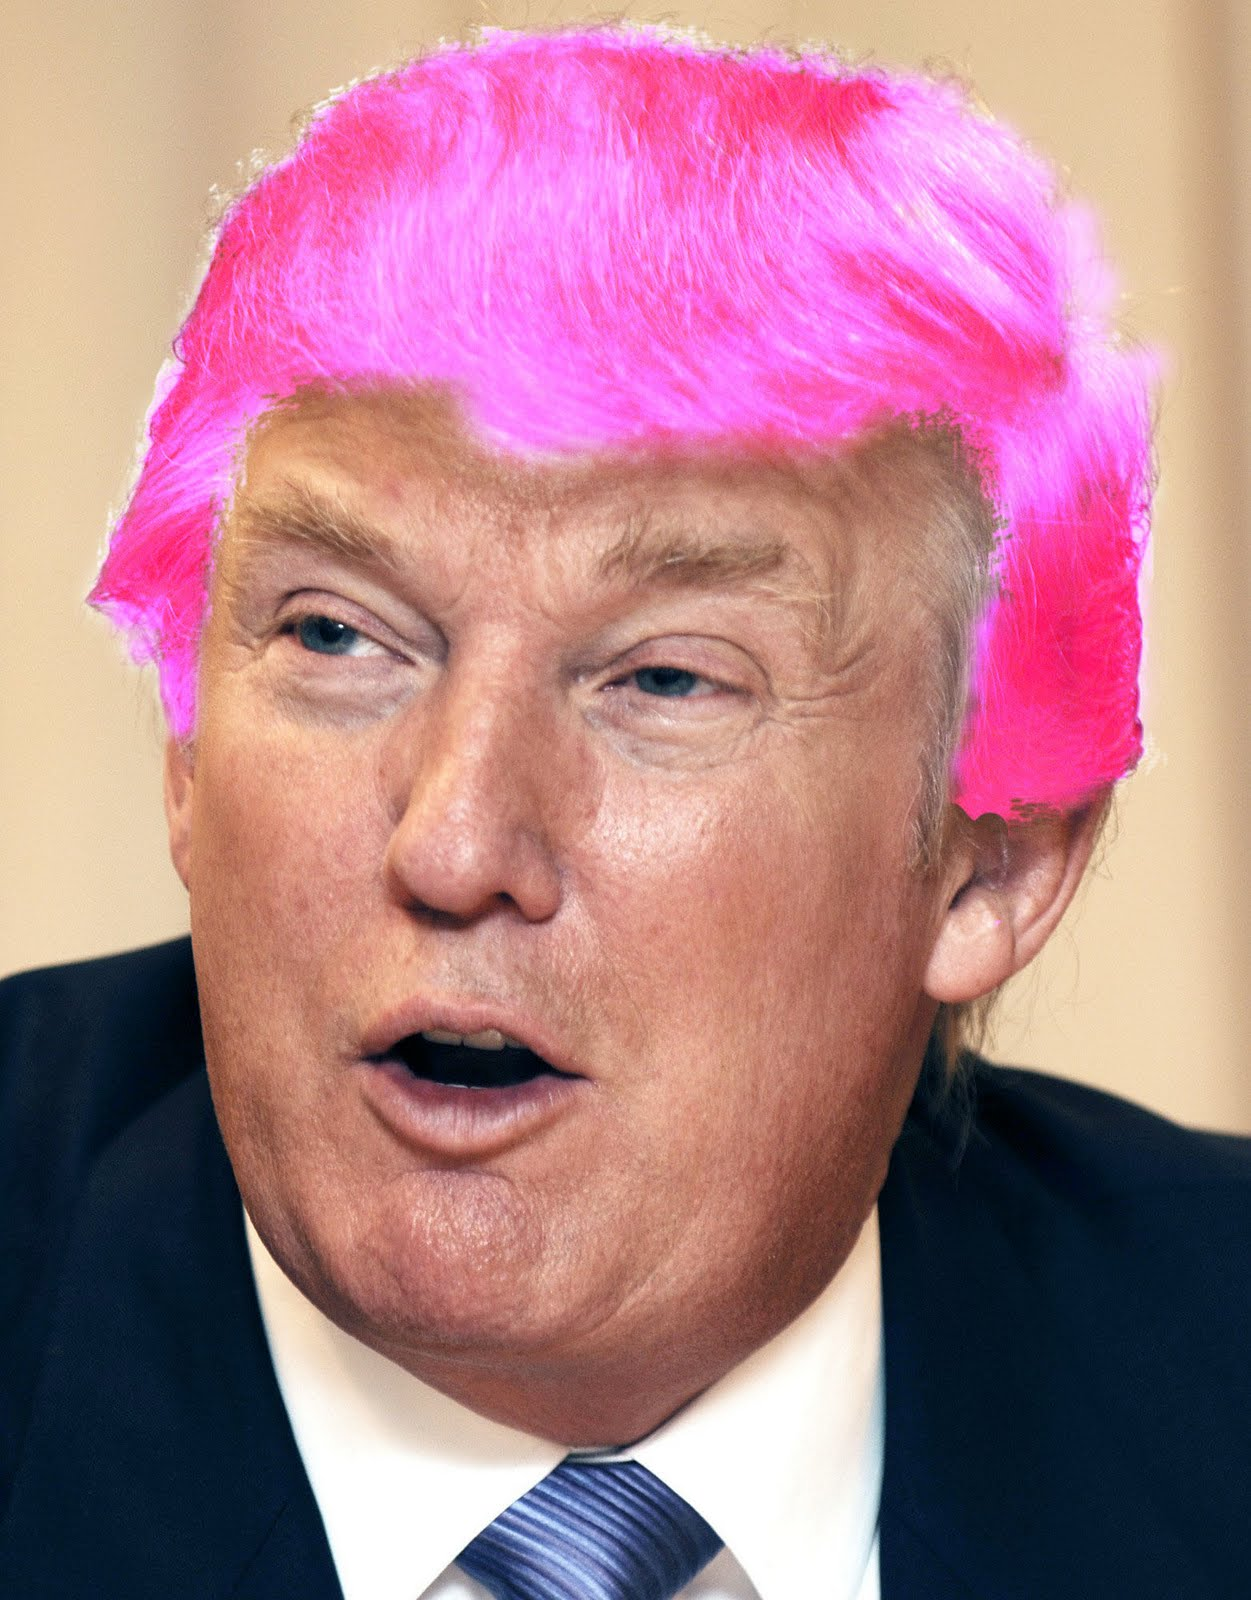 Billionaire Gambler Donald Trump Hair